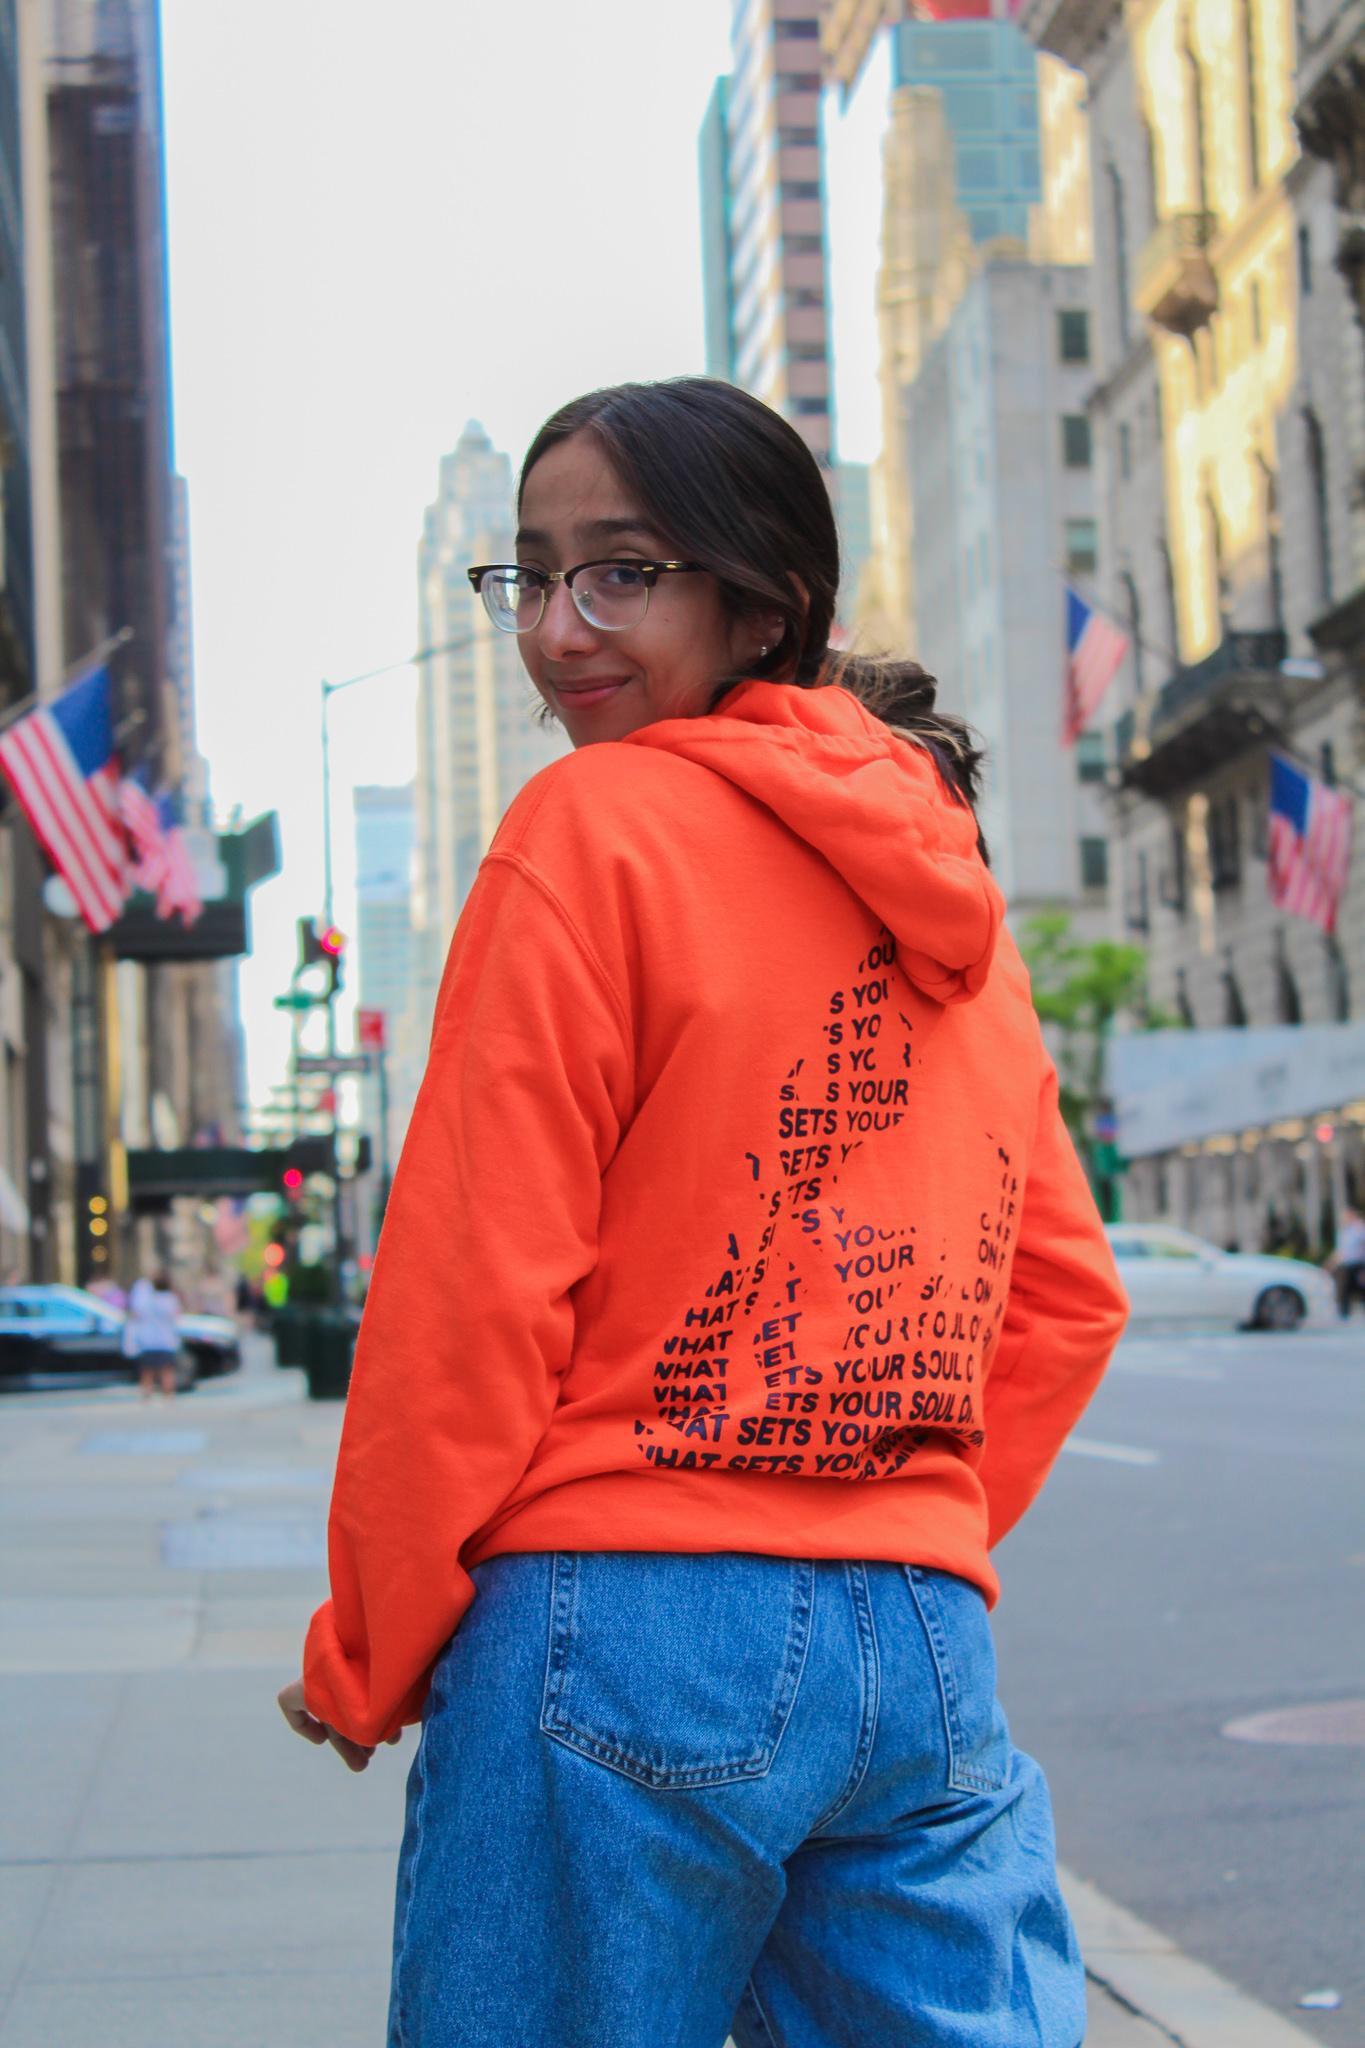 Seek What Sets Your Soul on Fire Orange Hoodie